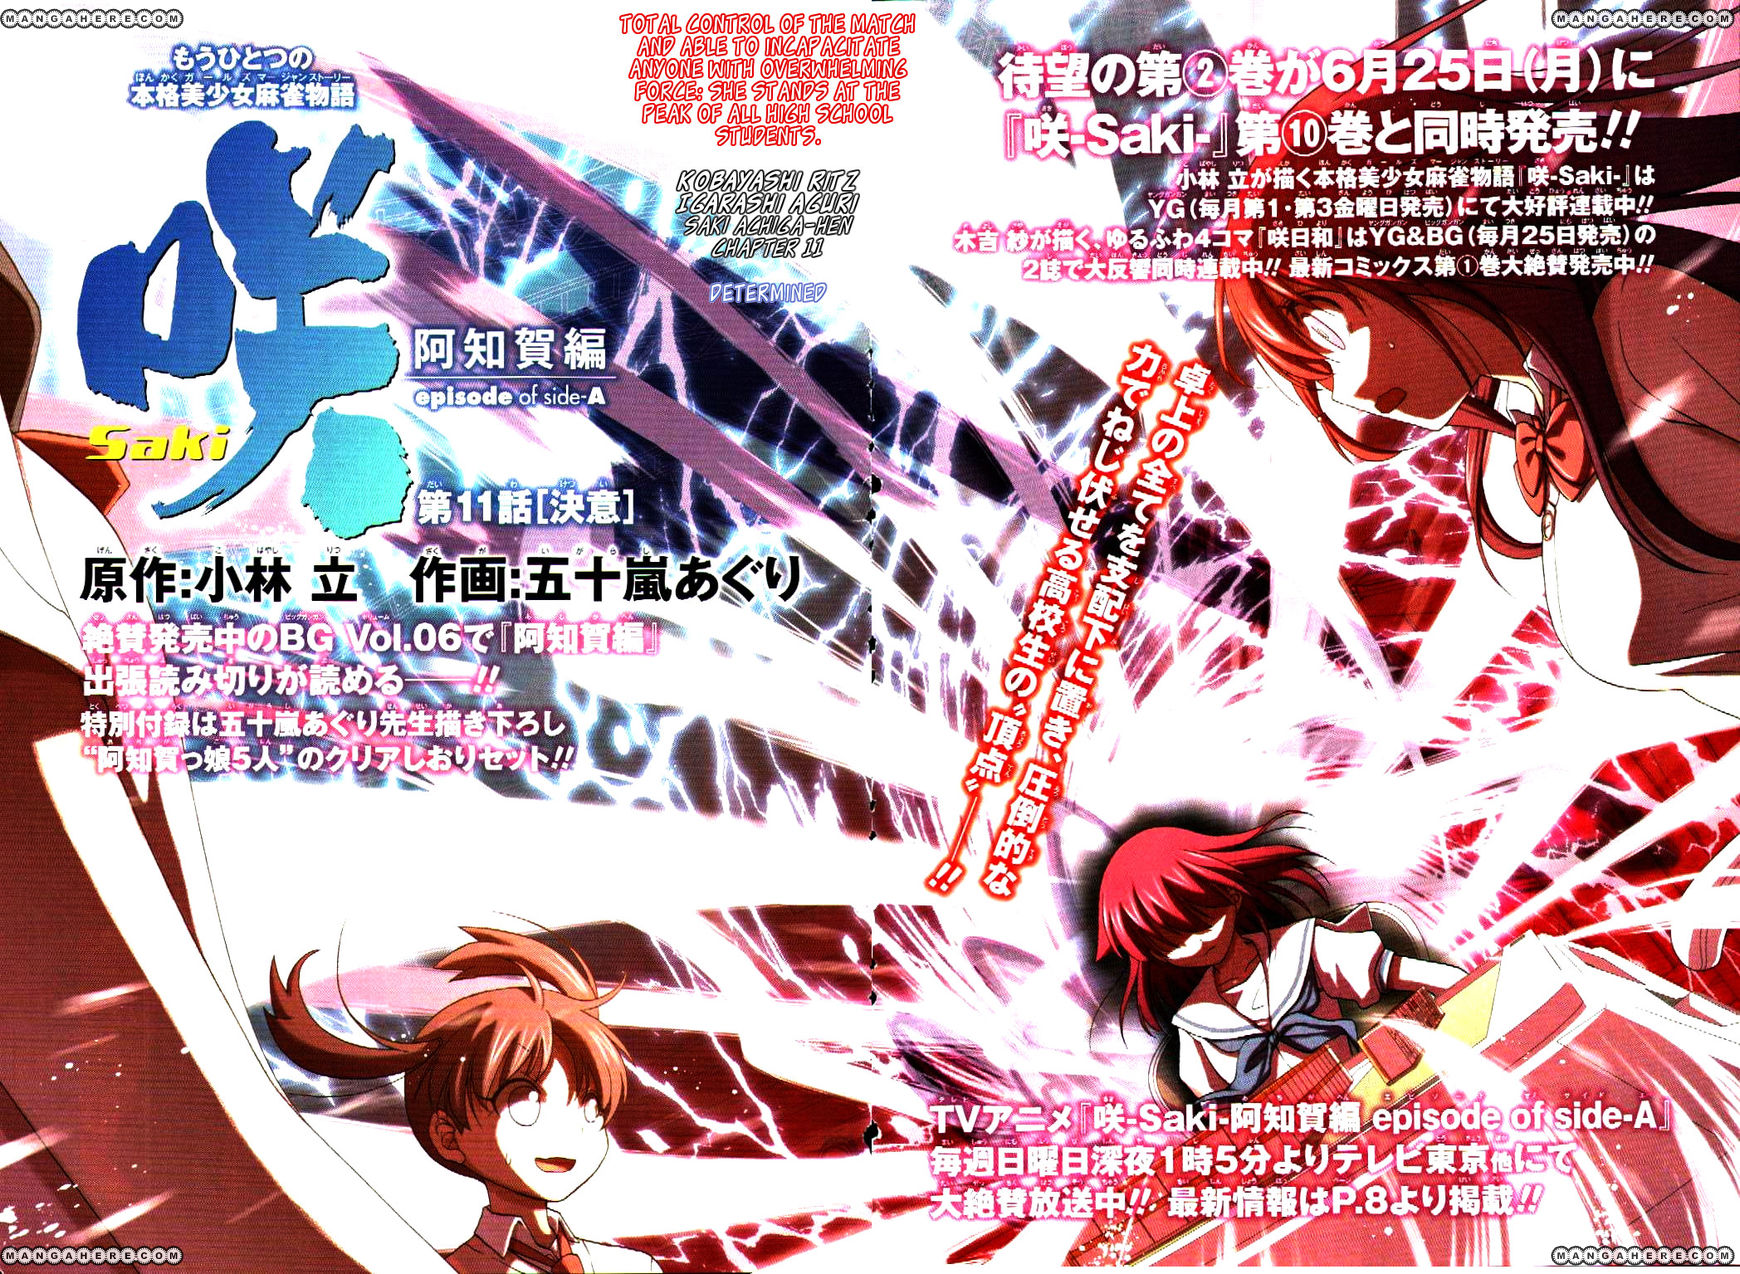 Saki Achiga Hen Episode Of Side A 11 Page 3